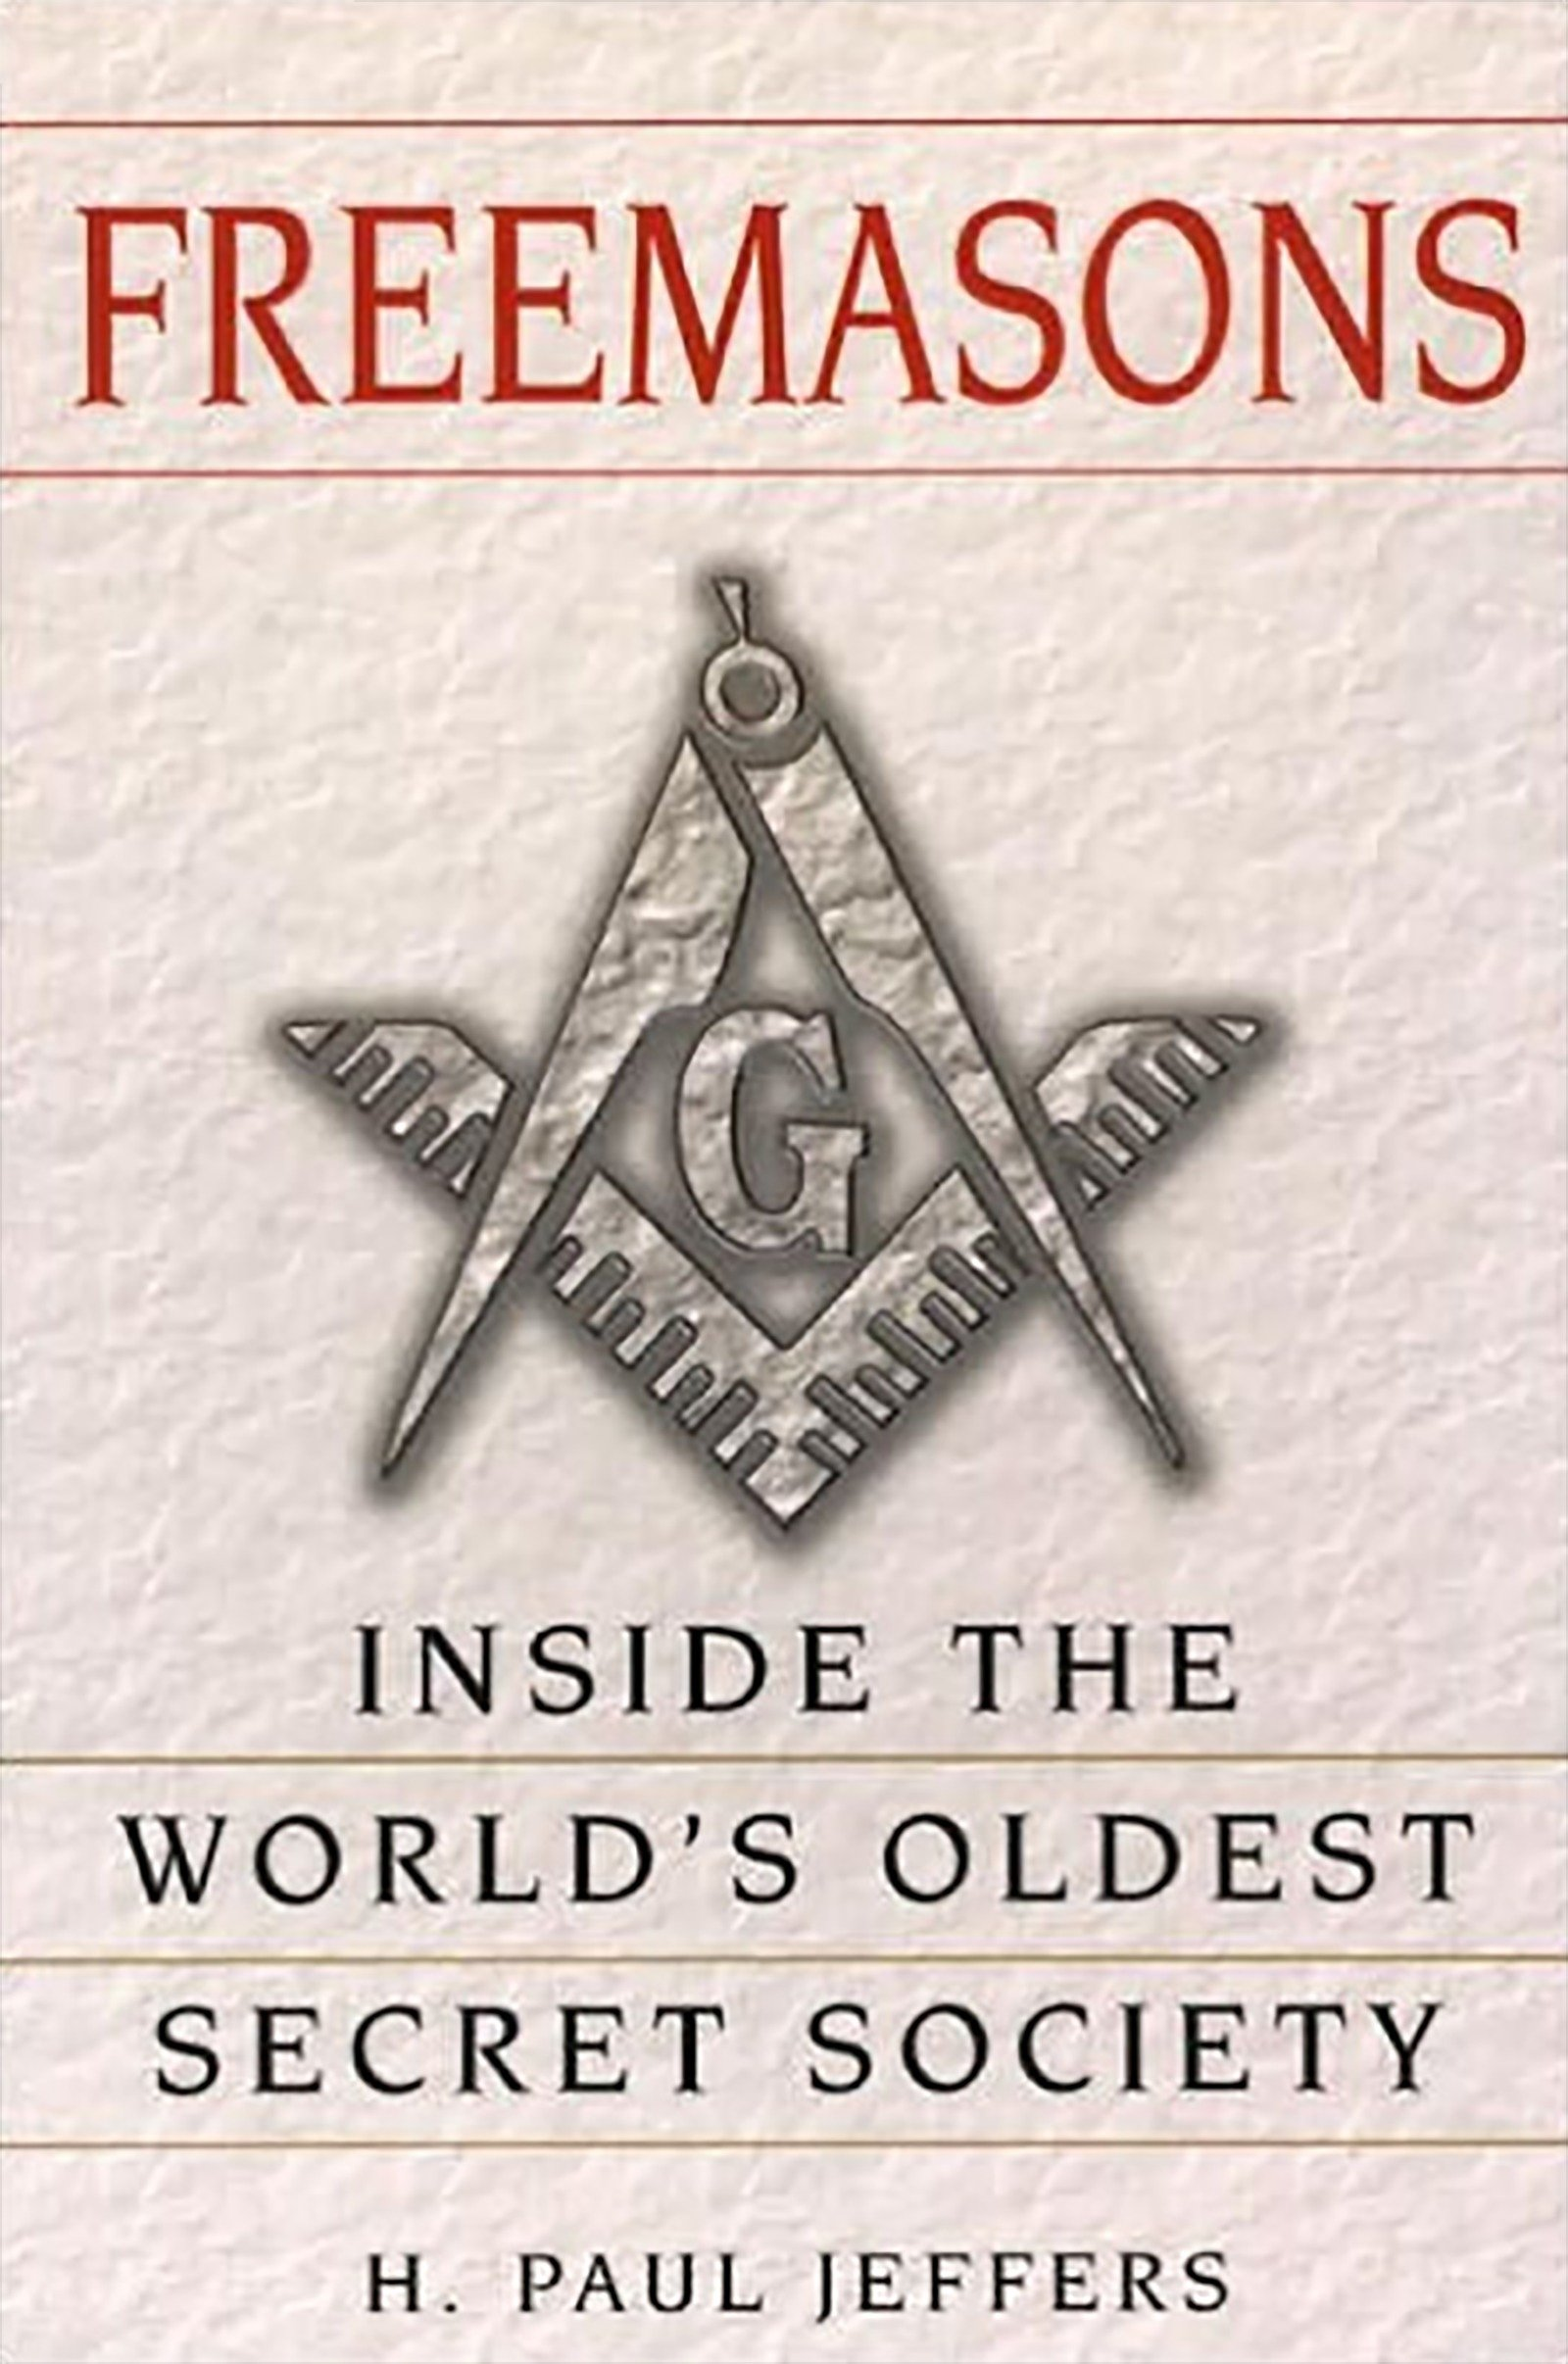 Freemasons: Inside the World's: Inside the World's Oldest Secret Society